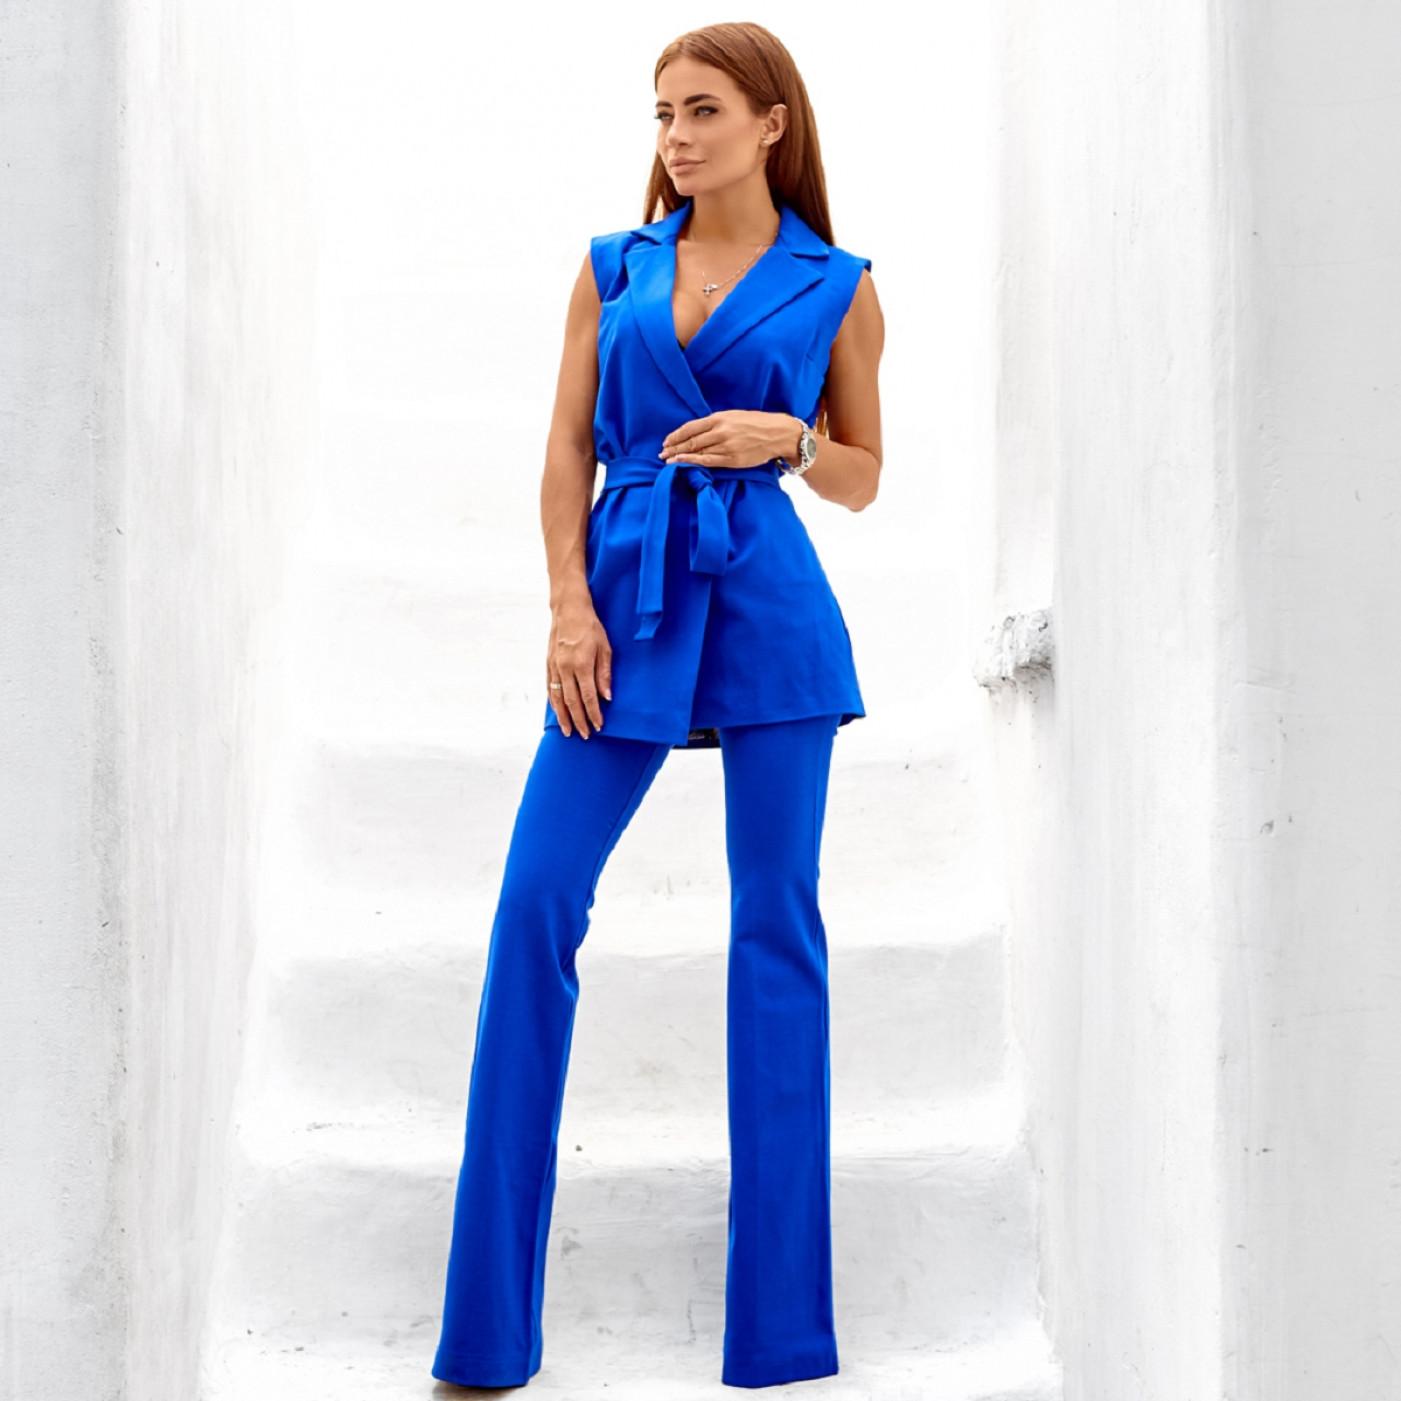 Костюм елегантний жилет + штани 10586